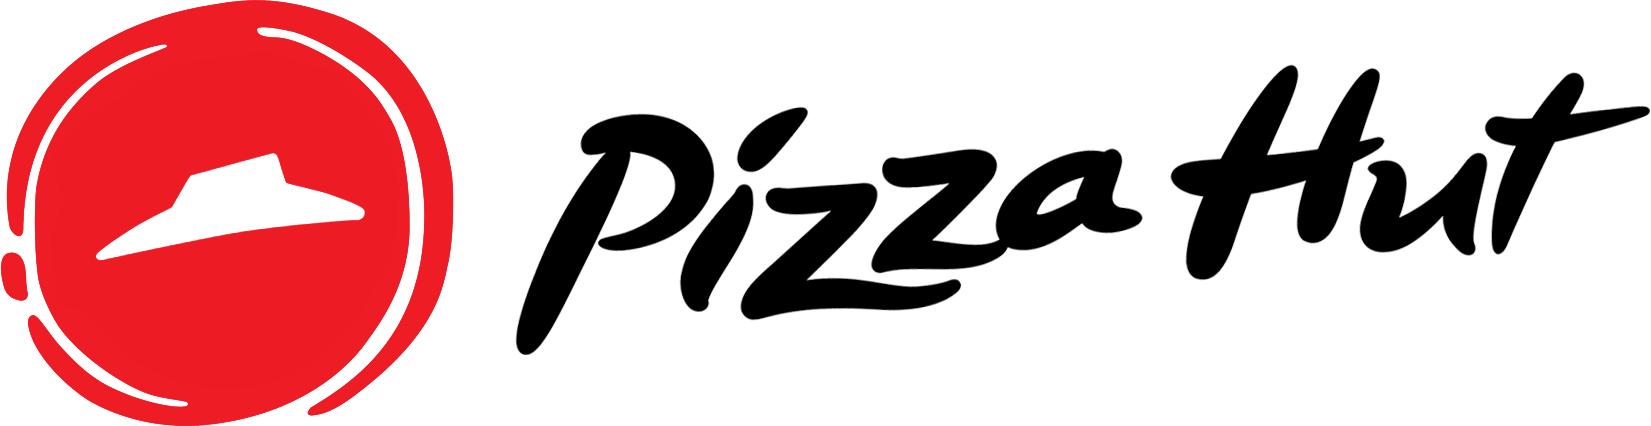 PizzaHut-logo.png